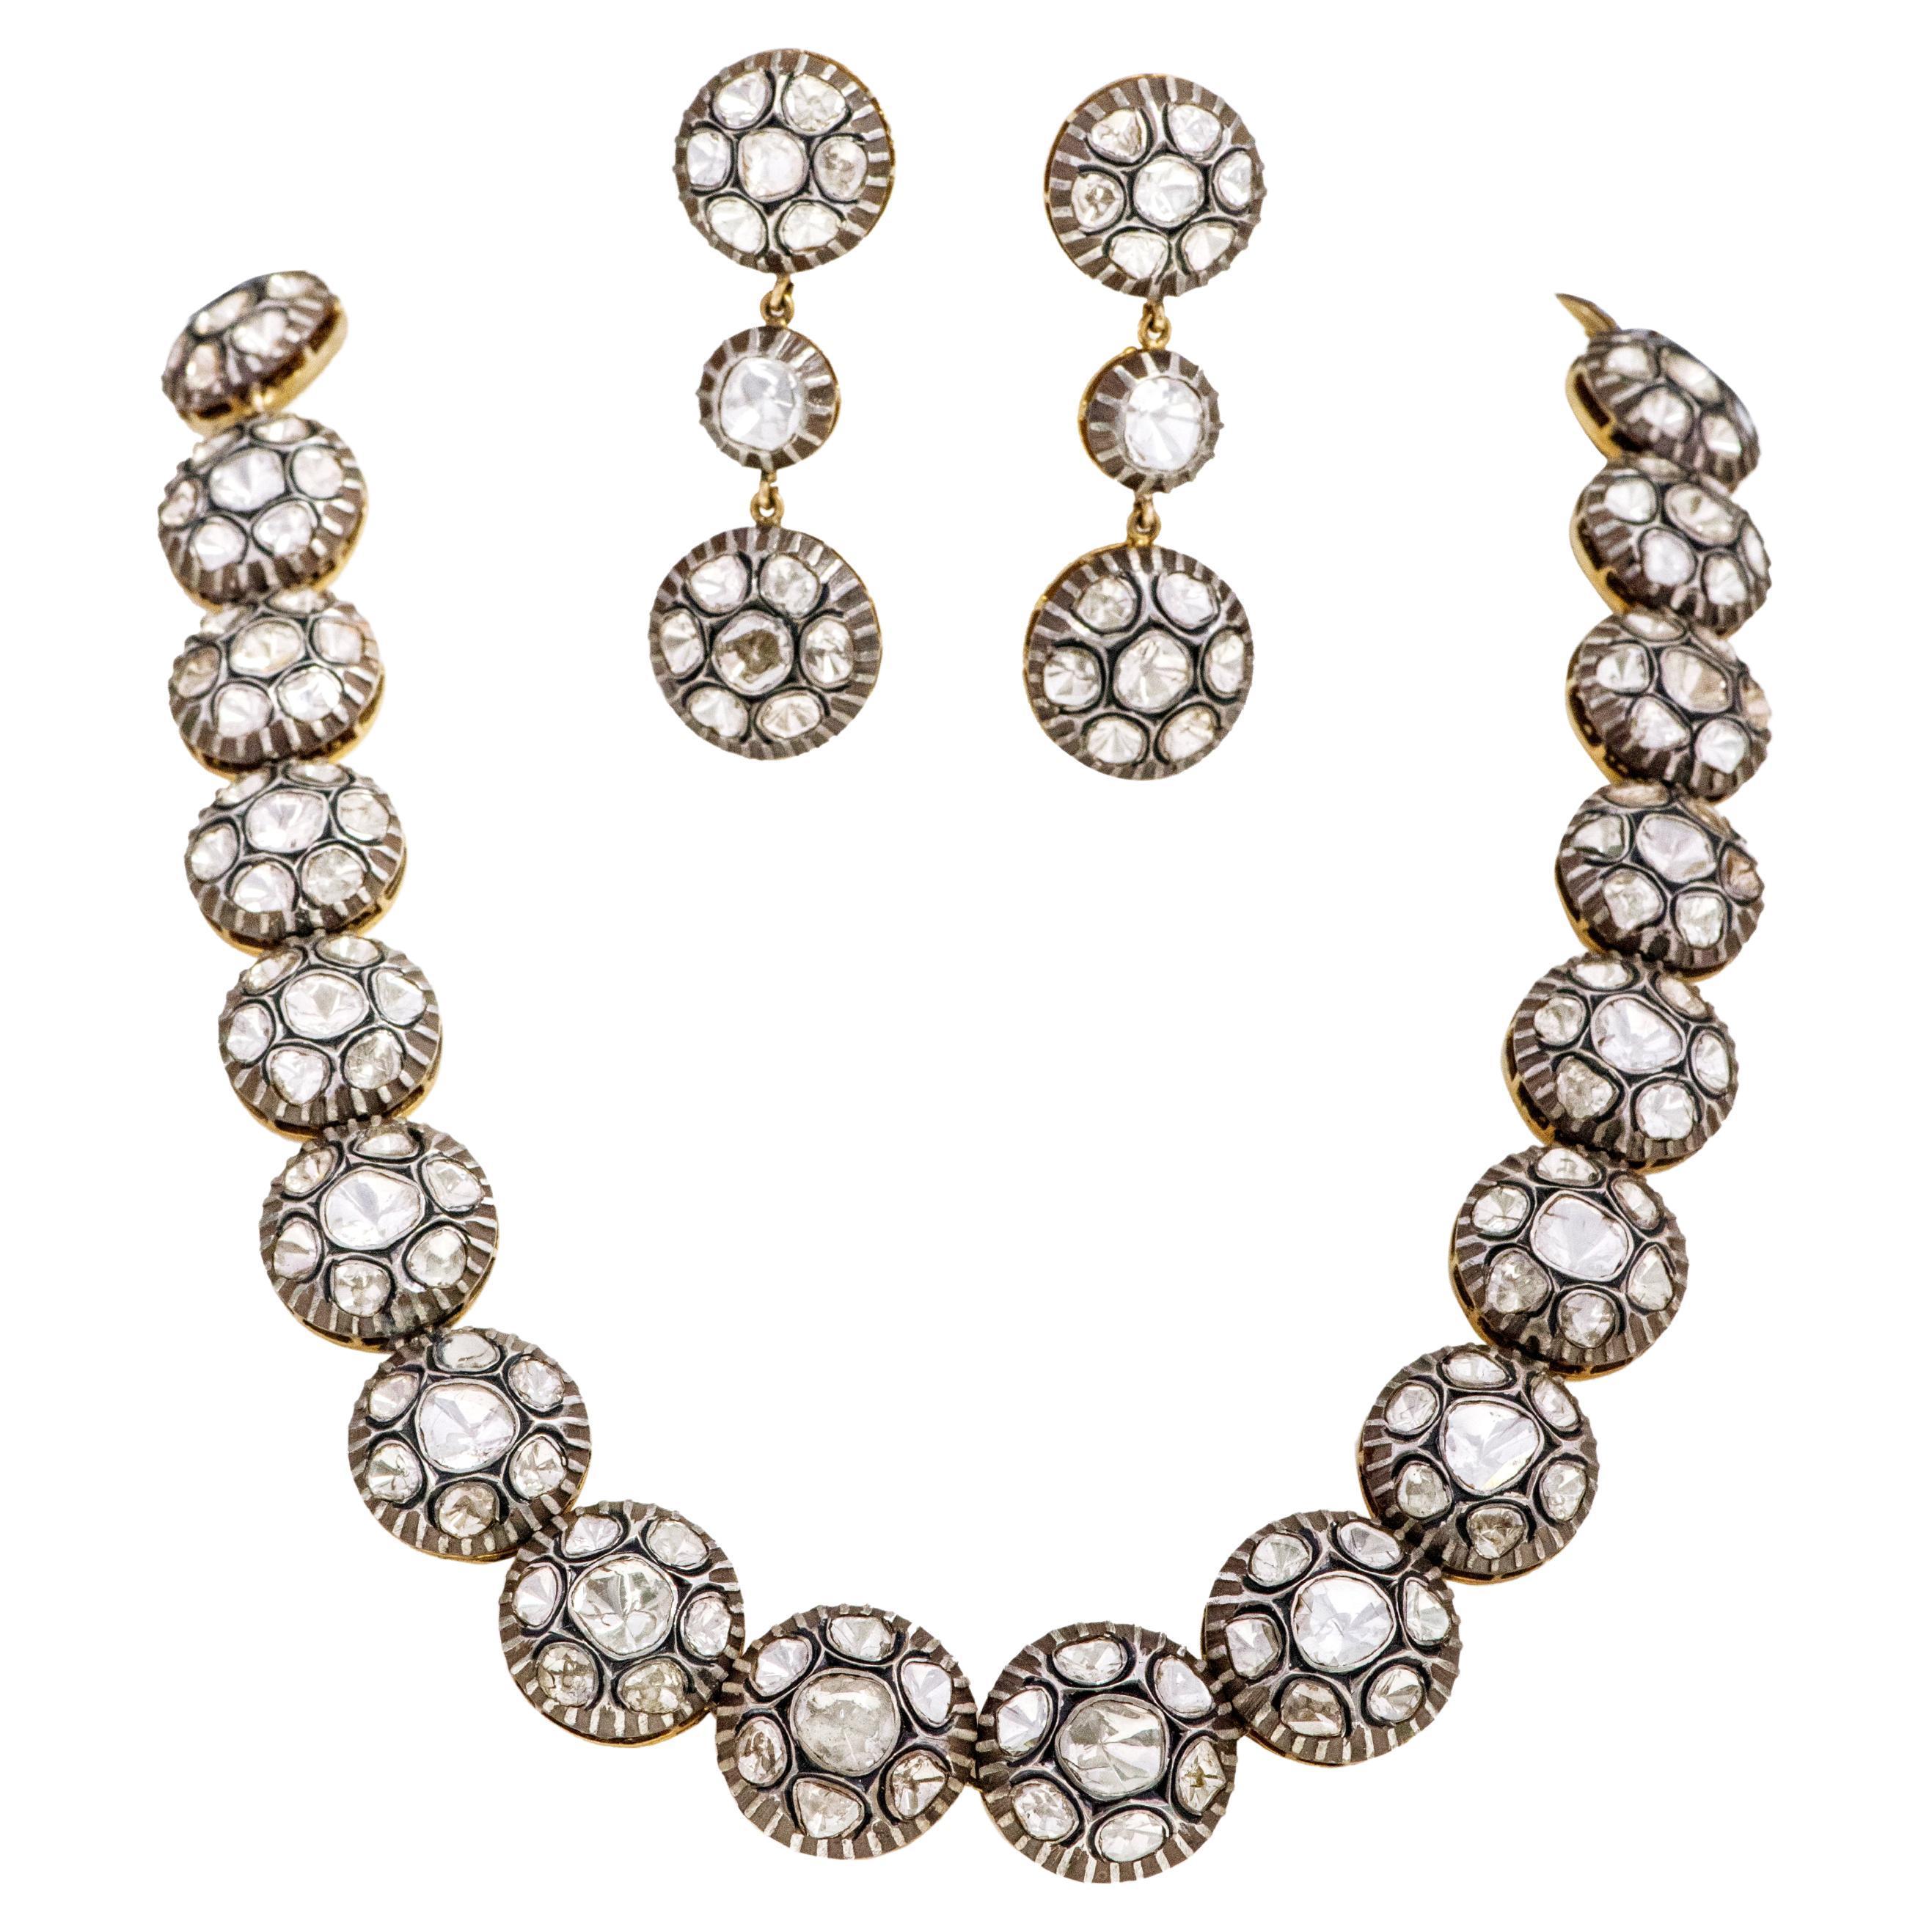 Art-Deco Victorian Style Polki Diamond Necklace and Earrings Set